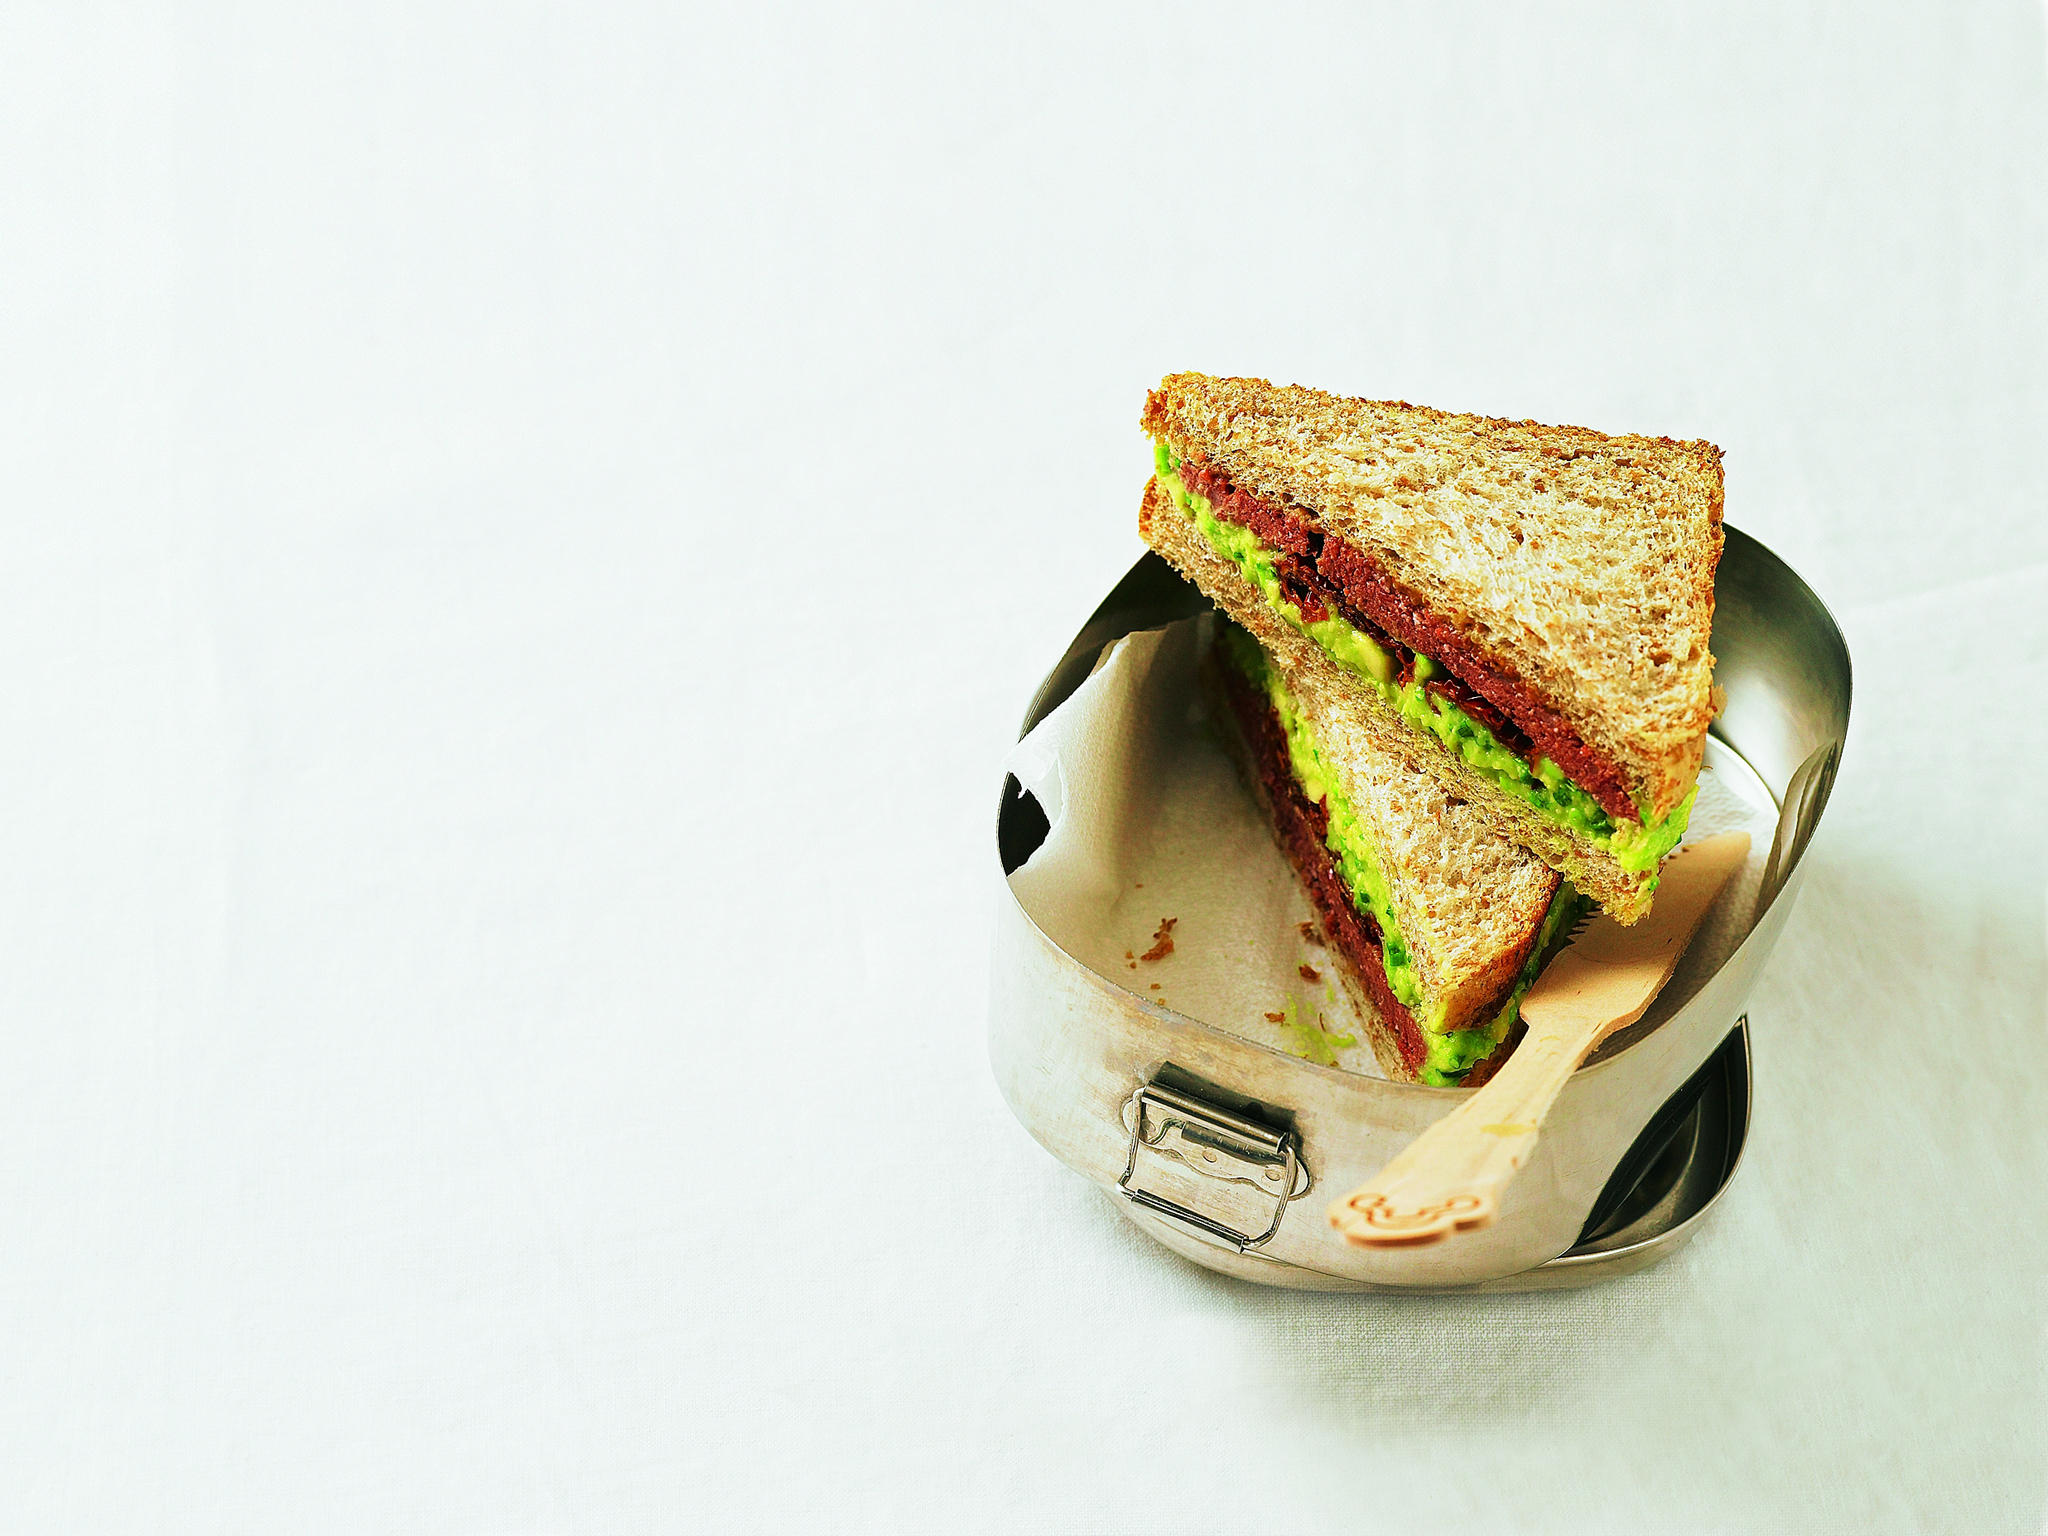 avocado beef sandwich. Black Bedroom Furniture Sets. Home Design Ideas